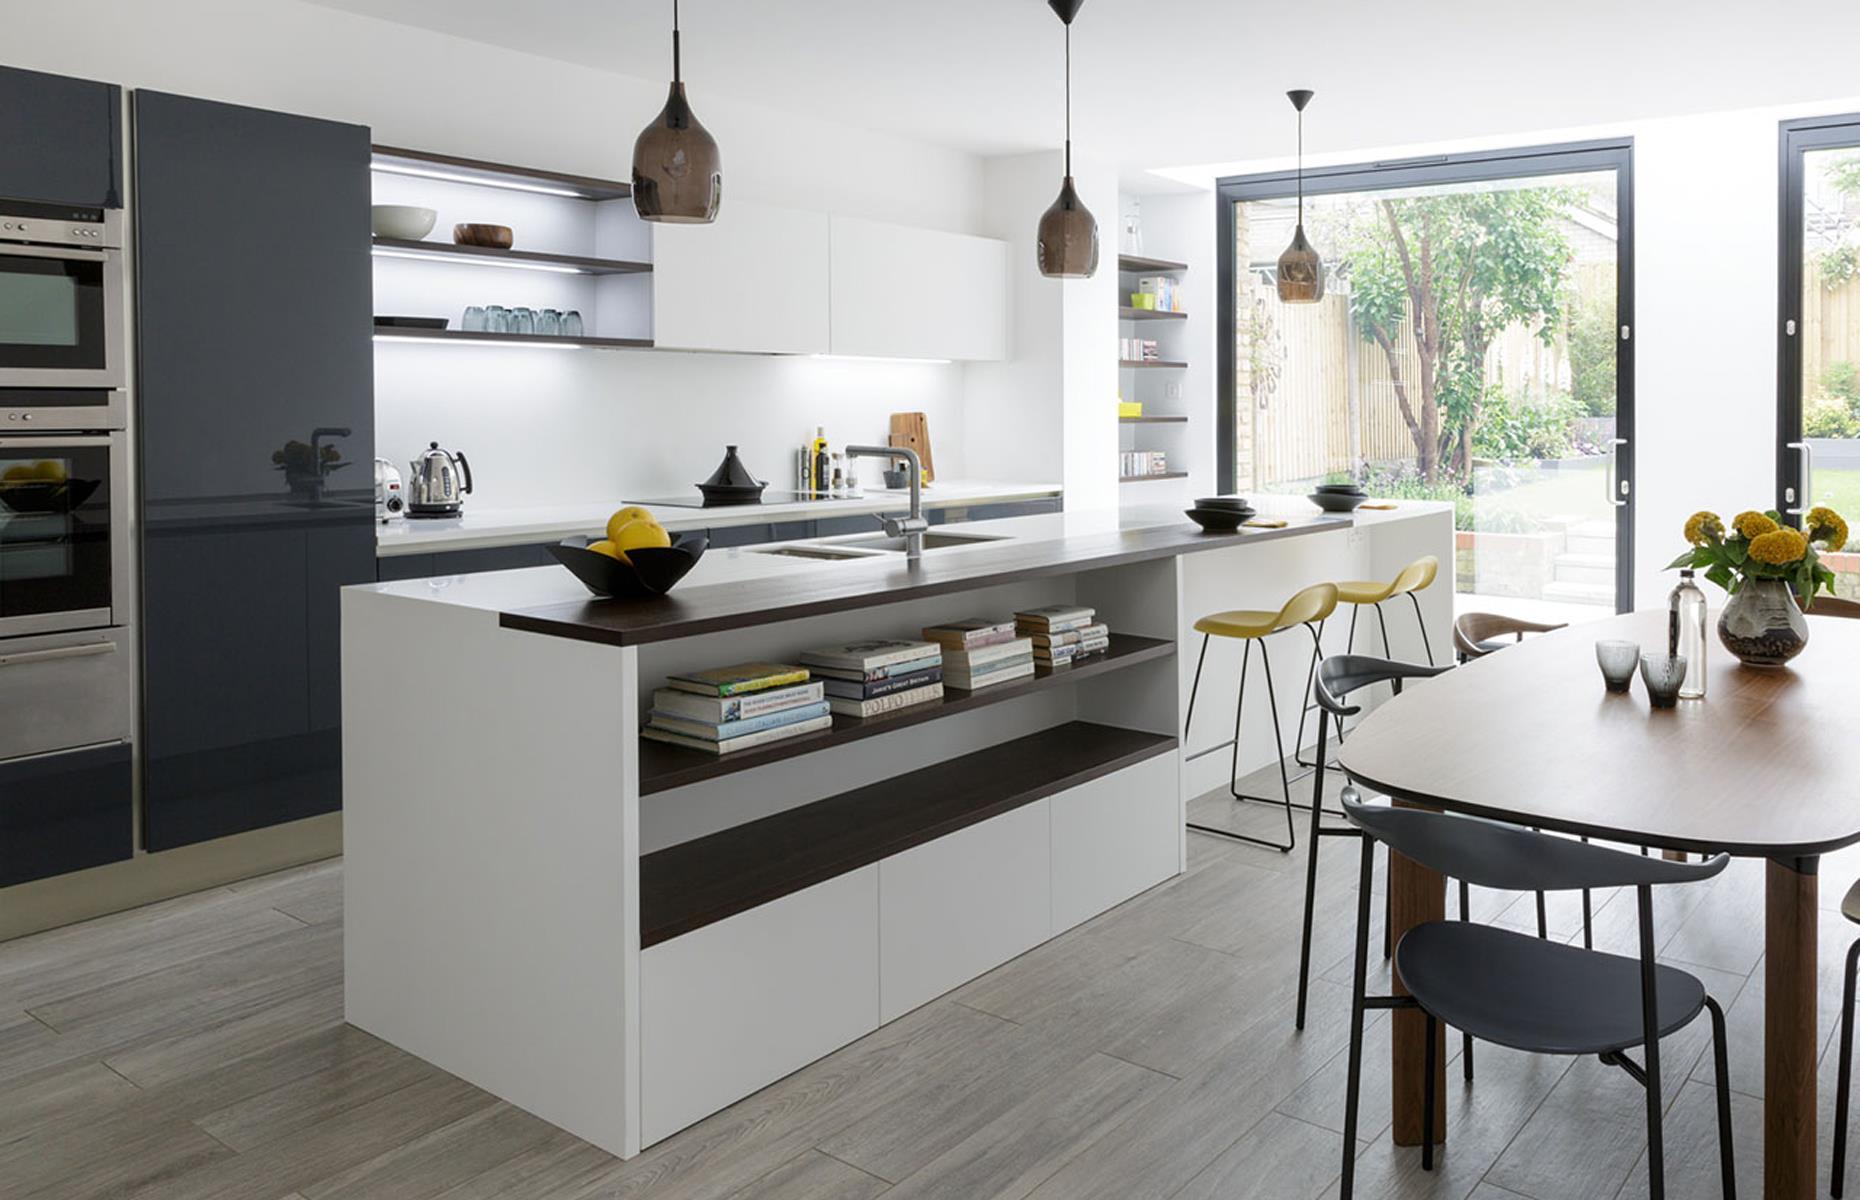 Image: Hubb Kitchens